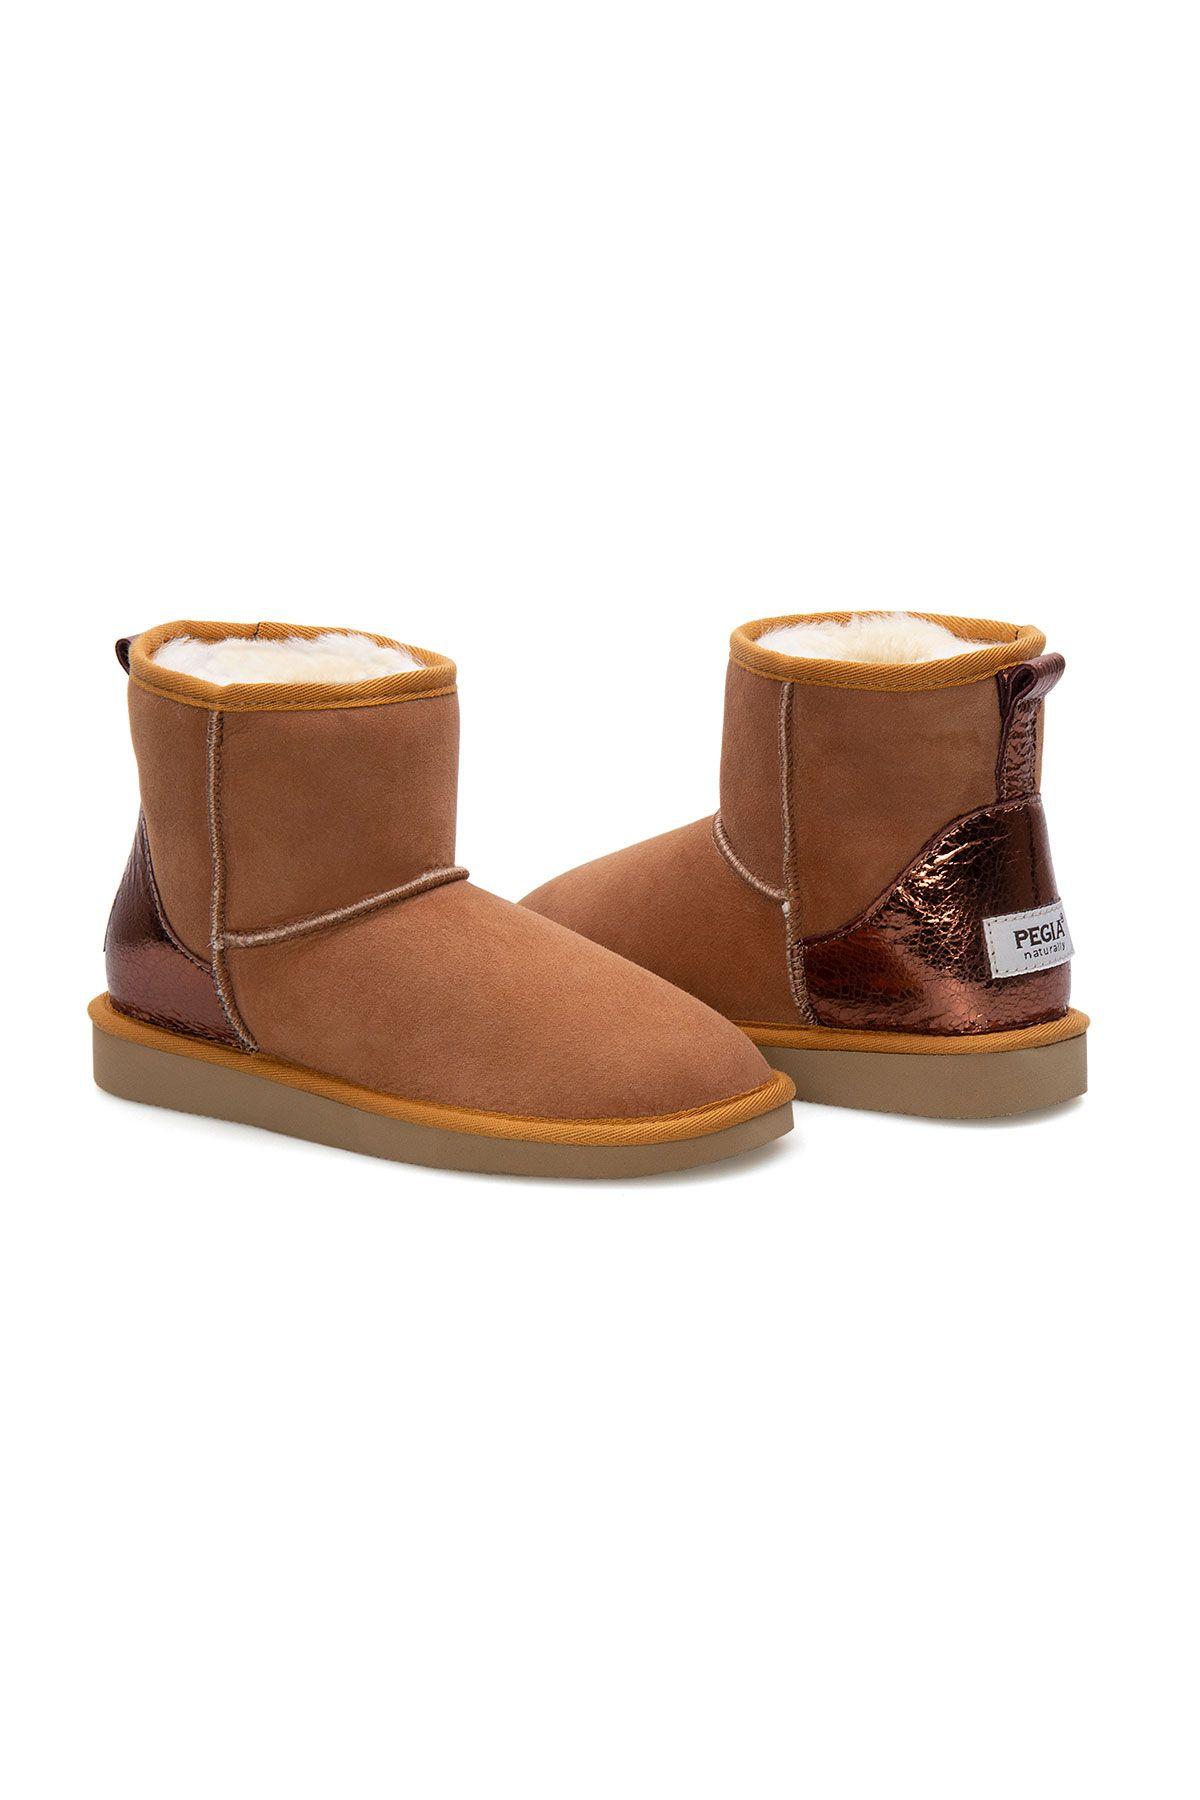 Pegia Women's Heel Detailed Sheepskin Boots 191074 Ginger